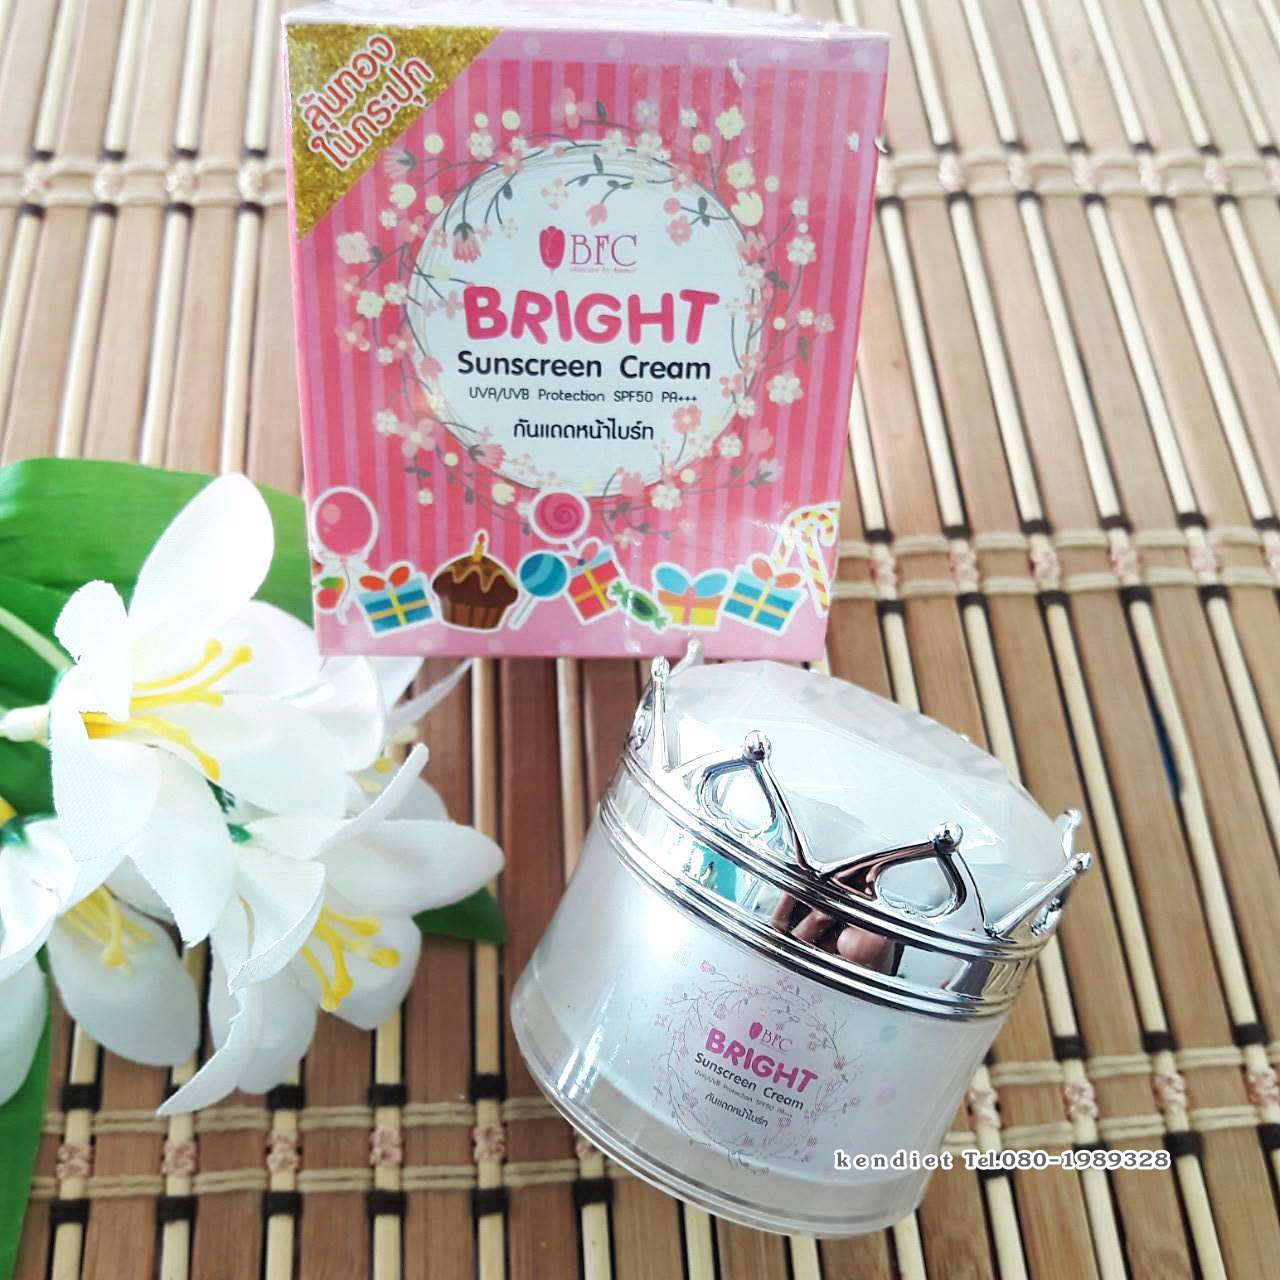 BFC Bright sunscreen Cream ครีมกันแดดหน้าไบร์ทบีเอฟซี ทาปุ๊ป เนียนปั๊ป